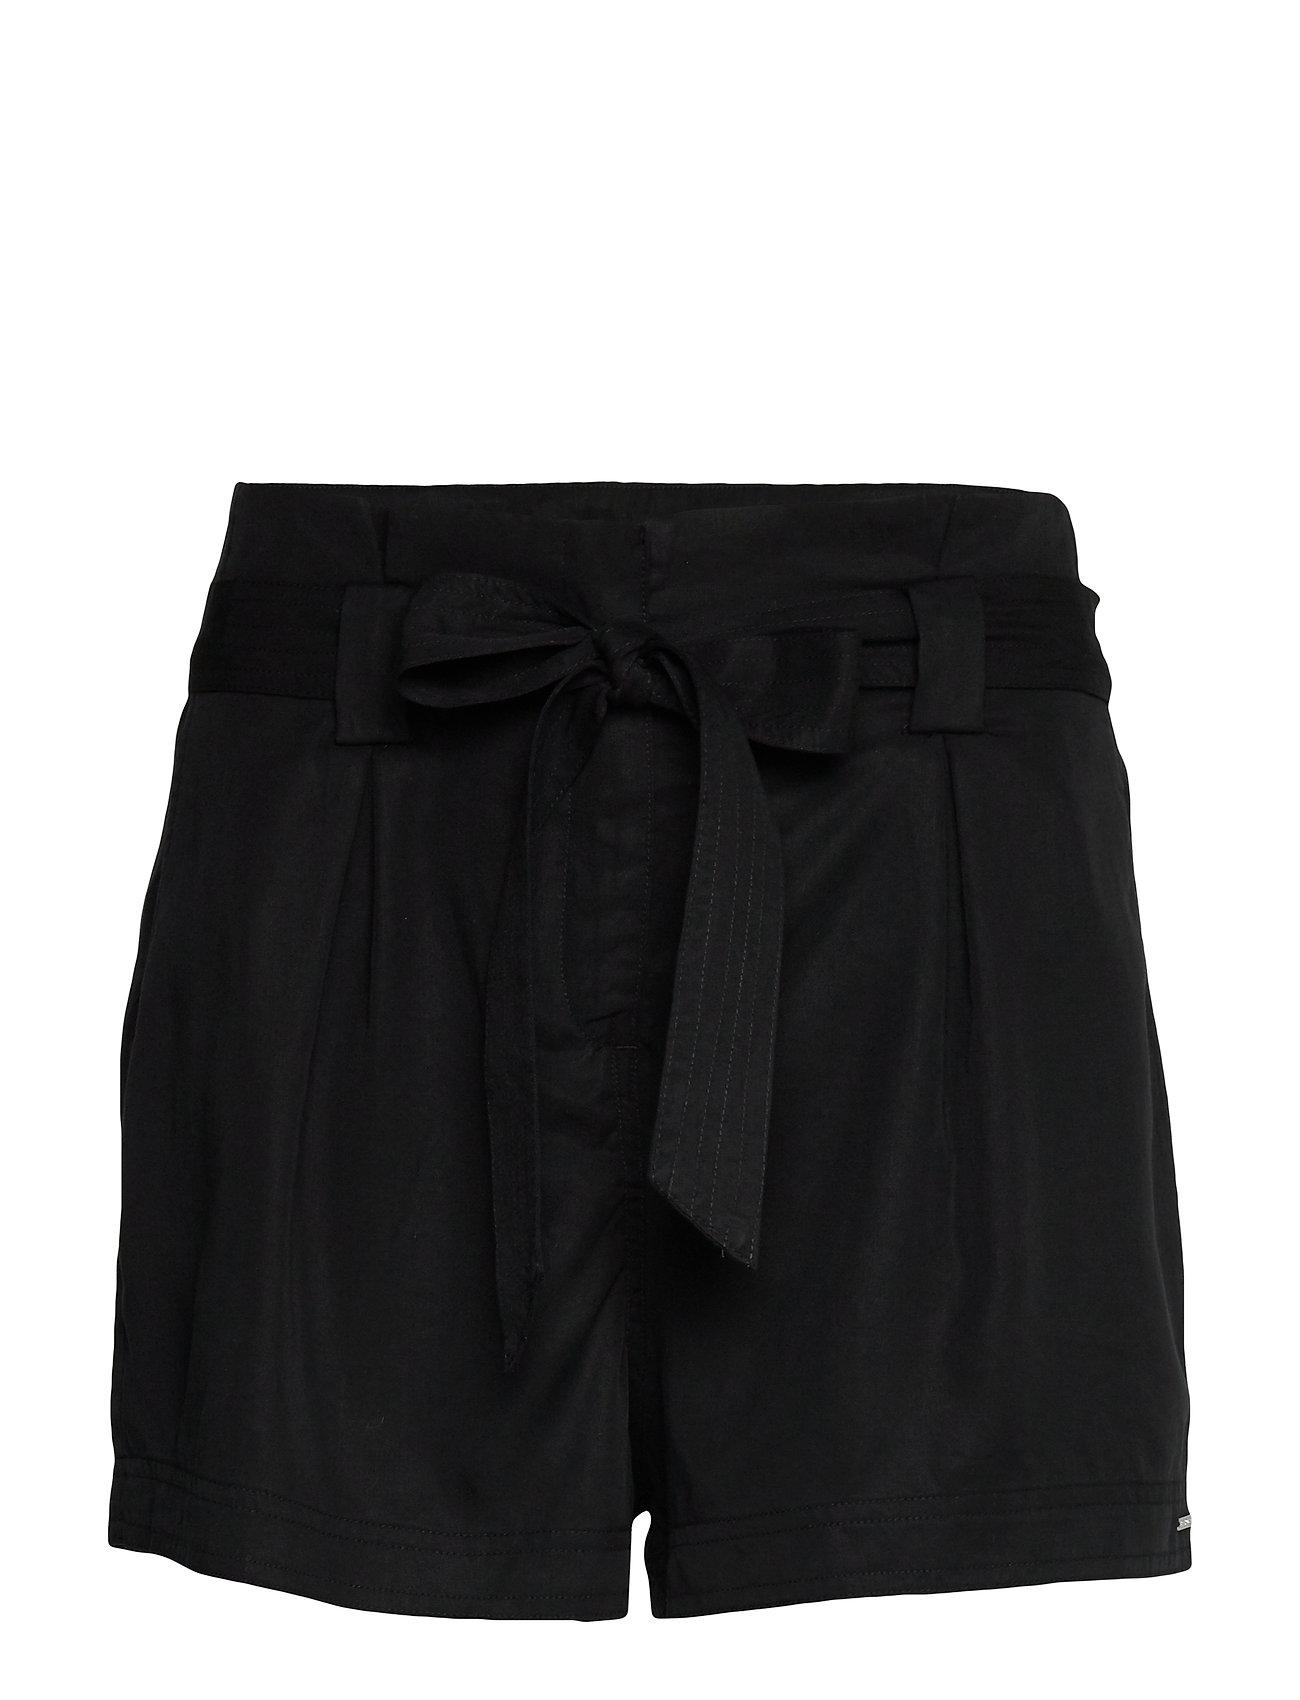 Image of Desert Paper Bag Short Shorts Flowy Shorts/Casual Shorts Sort Superdry (3351891067)